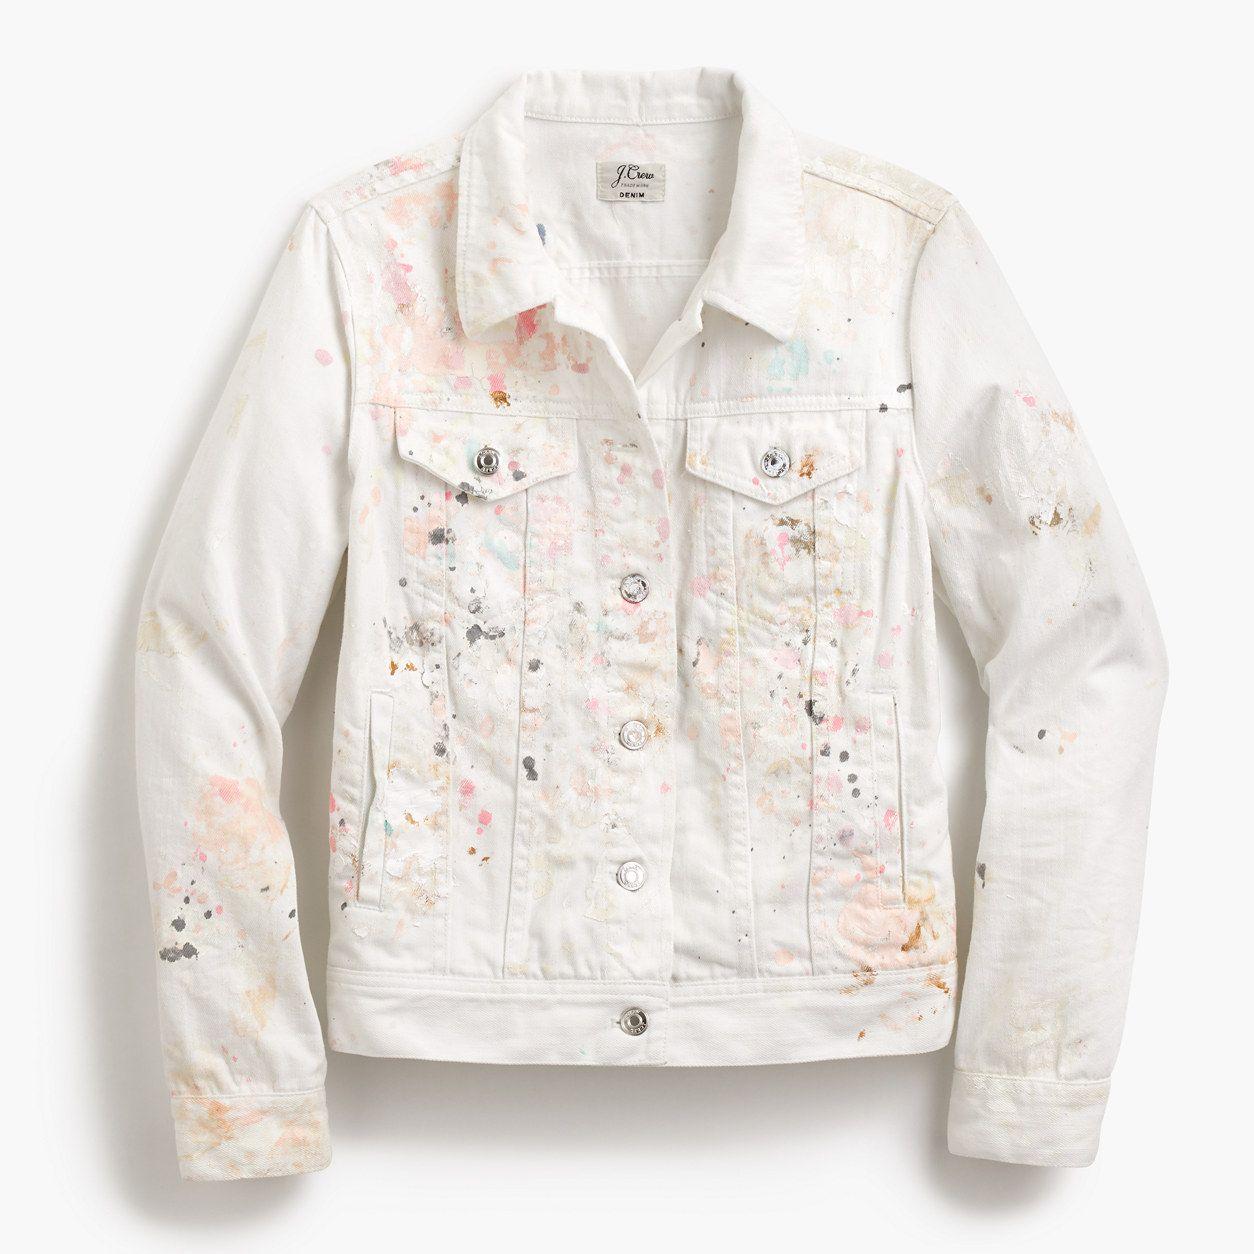 J Crew Womens Limited Edition Denim Jacket In Paint Splatter Size Denim Jacket Denim Women Outerwear Women [ 1254 x 1254 Pixel ]